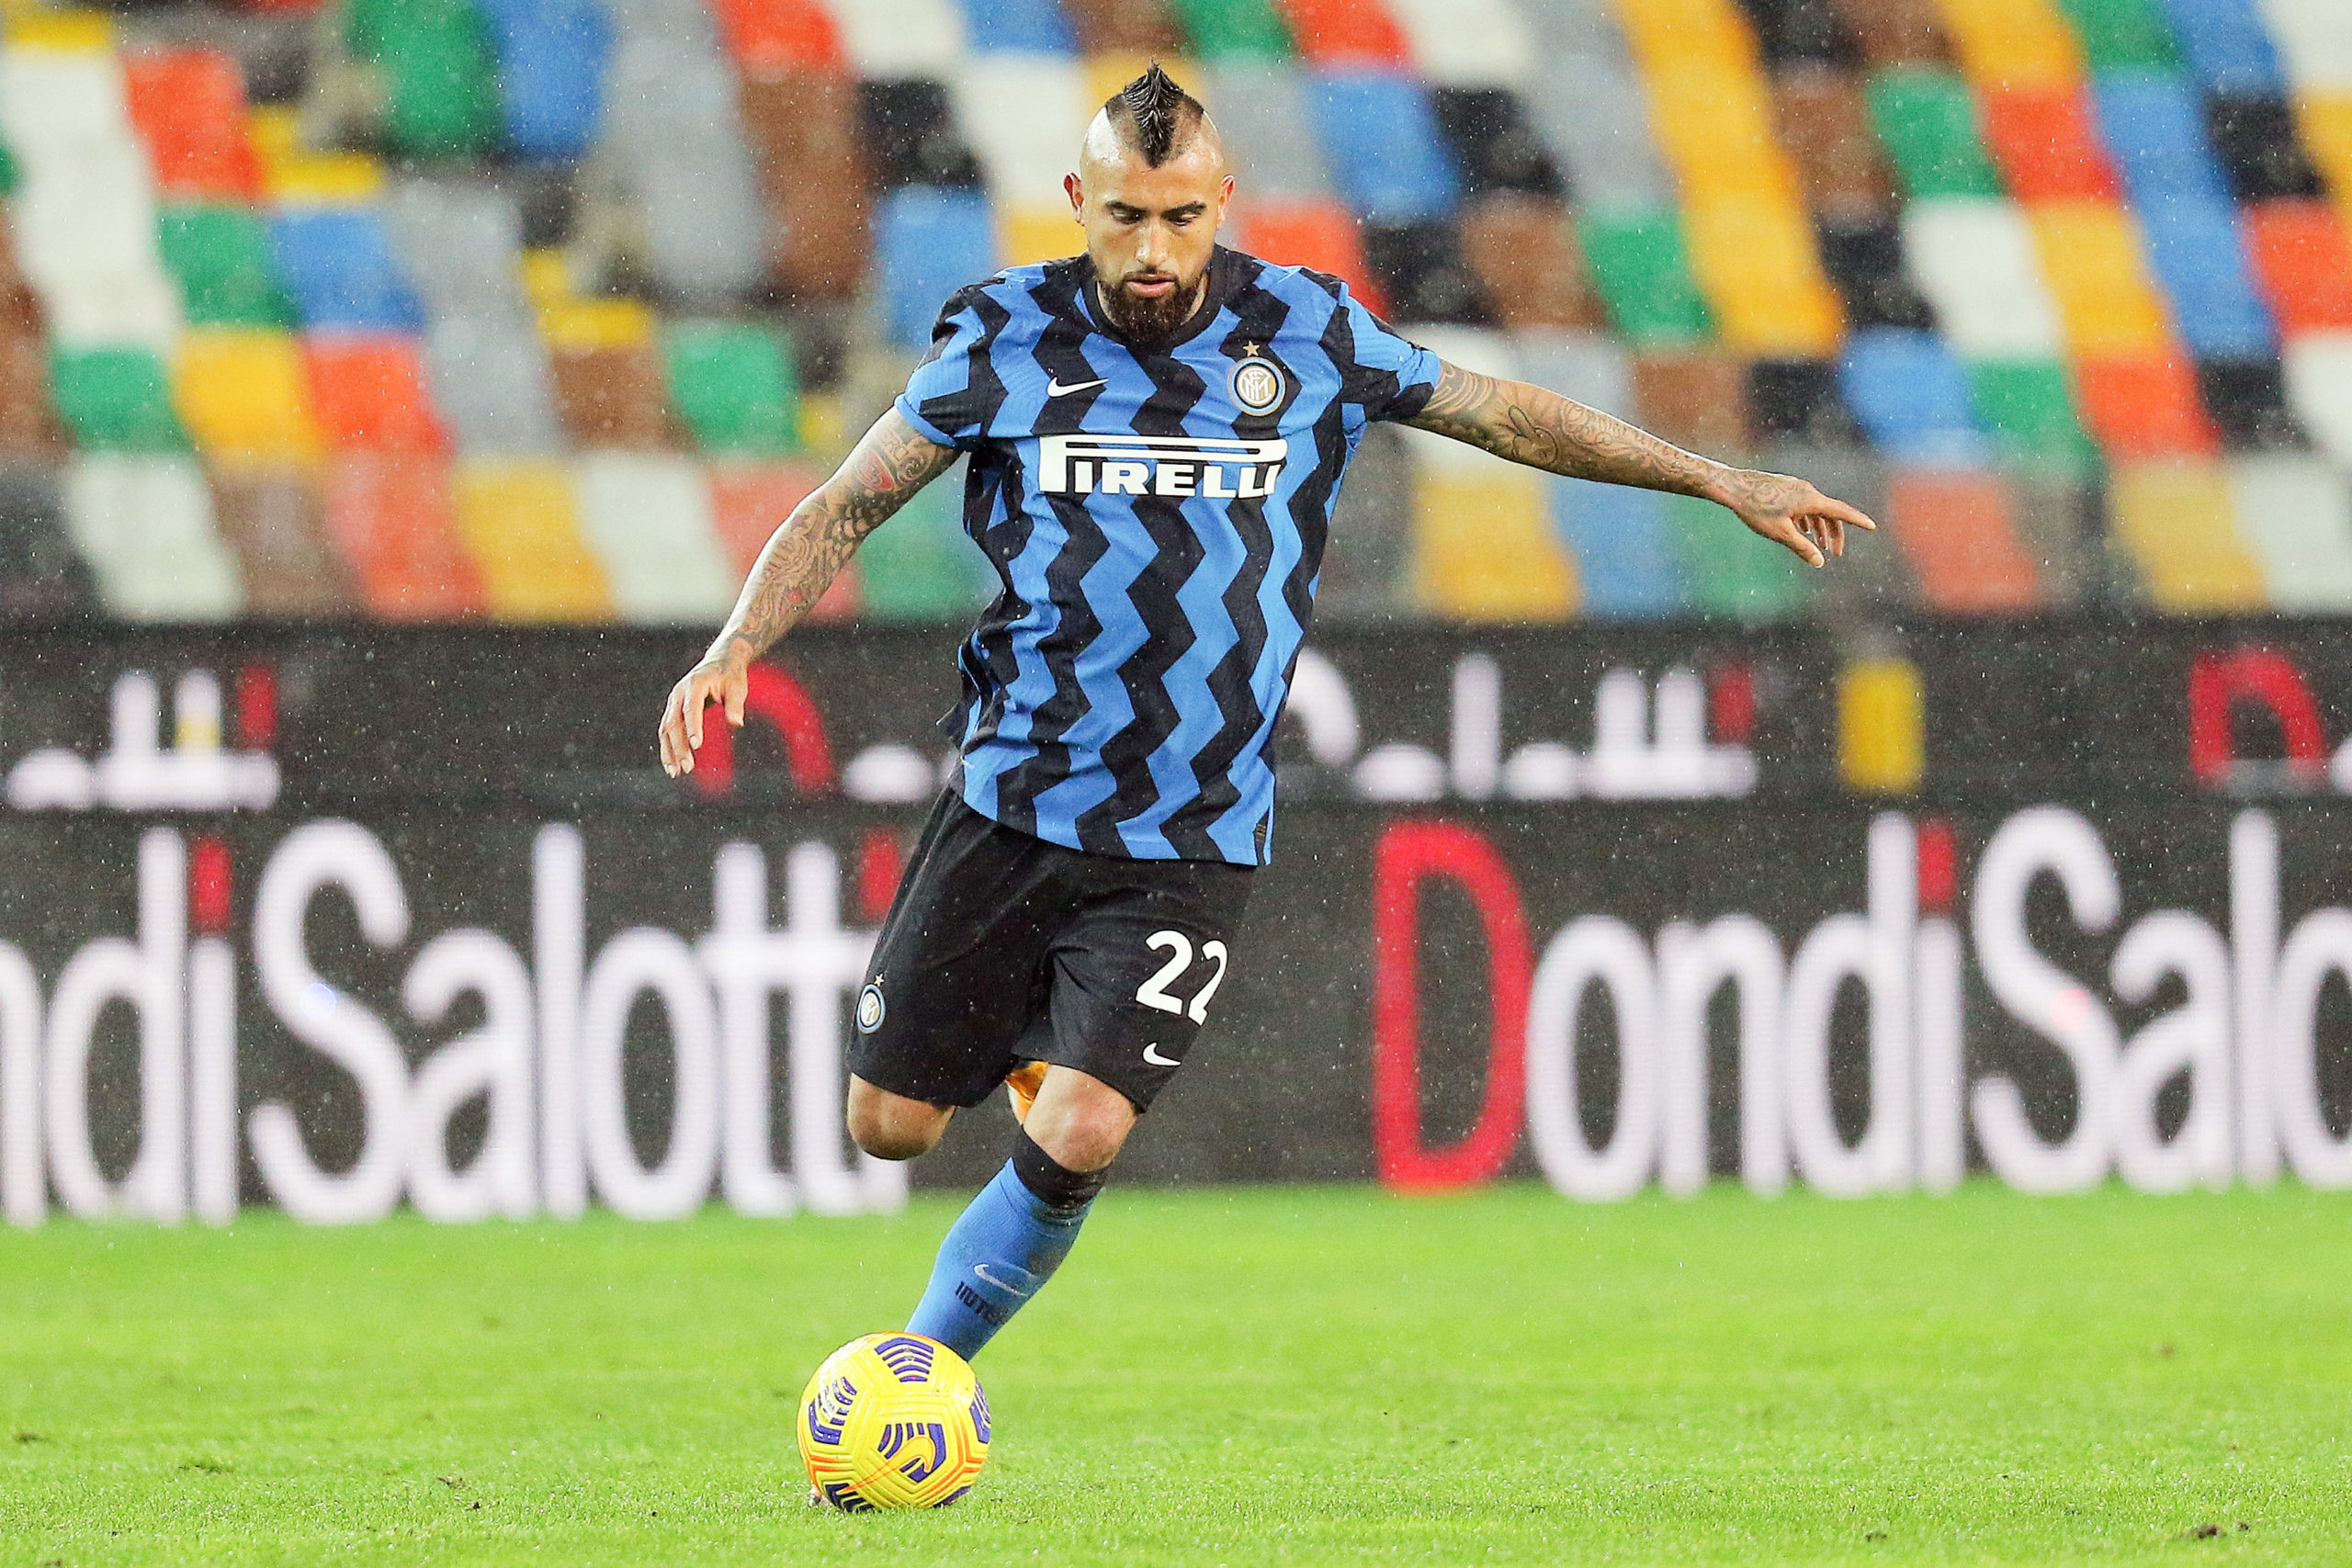 Mercato OM : Arturo Vidal proche du clash avec l'Inter Milan ?